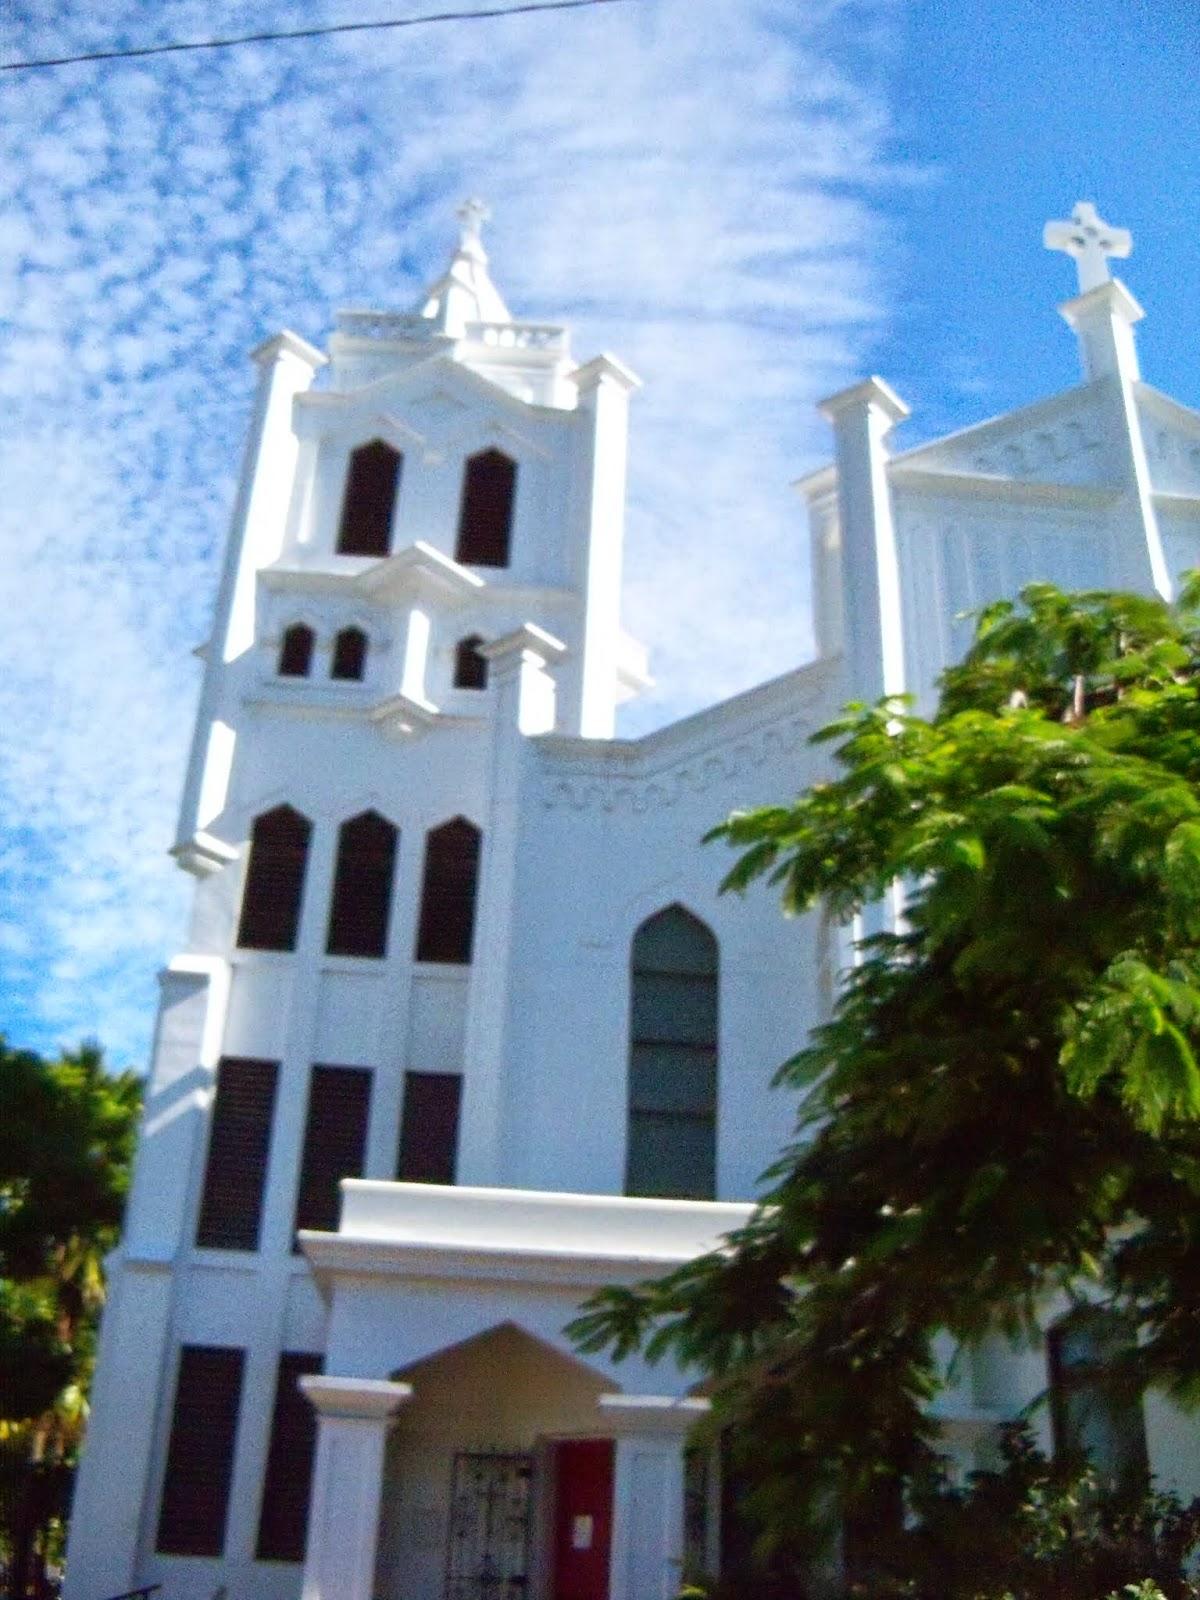 Key West Vacation - 116_5729.JPG